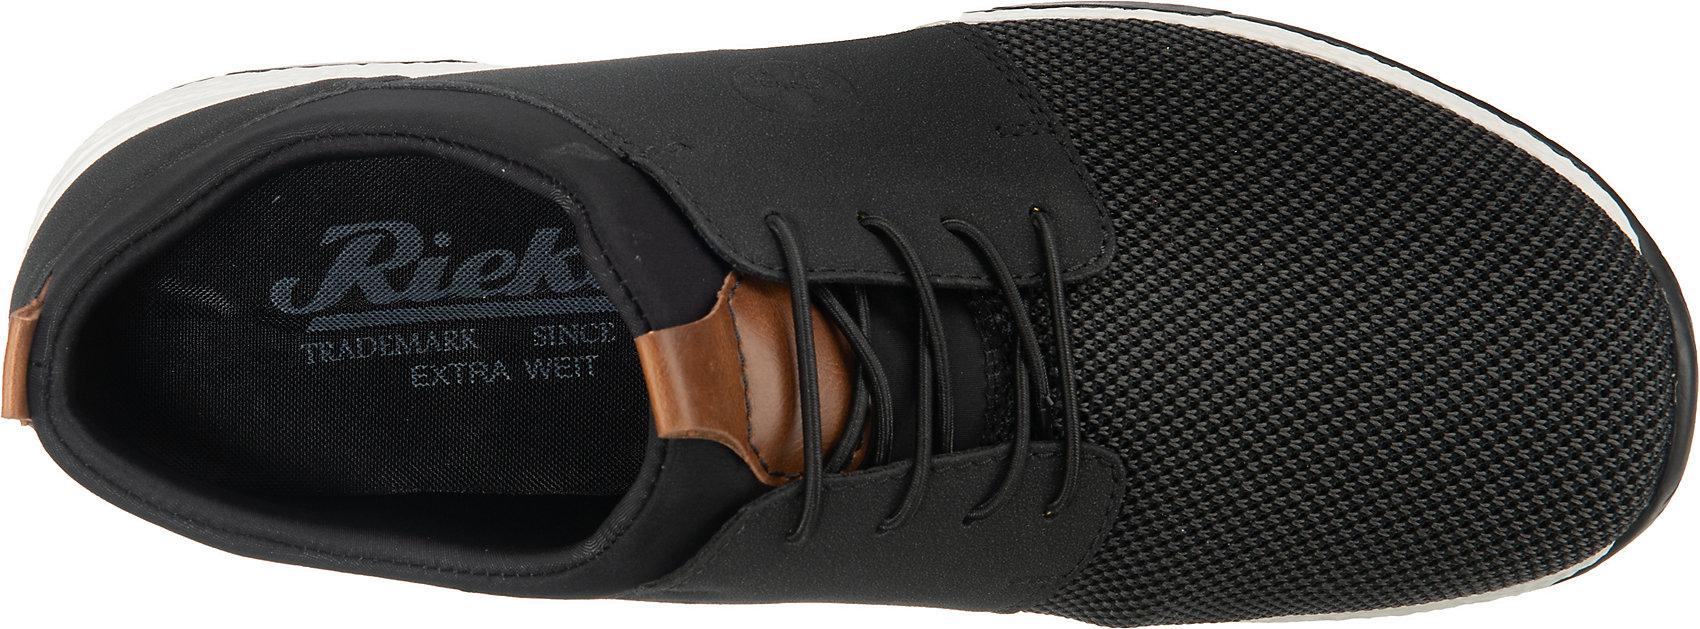 Indexbild 12 - Neu rieker Sneakers Low 12842477 für Herren schwarz